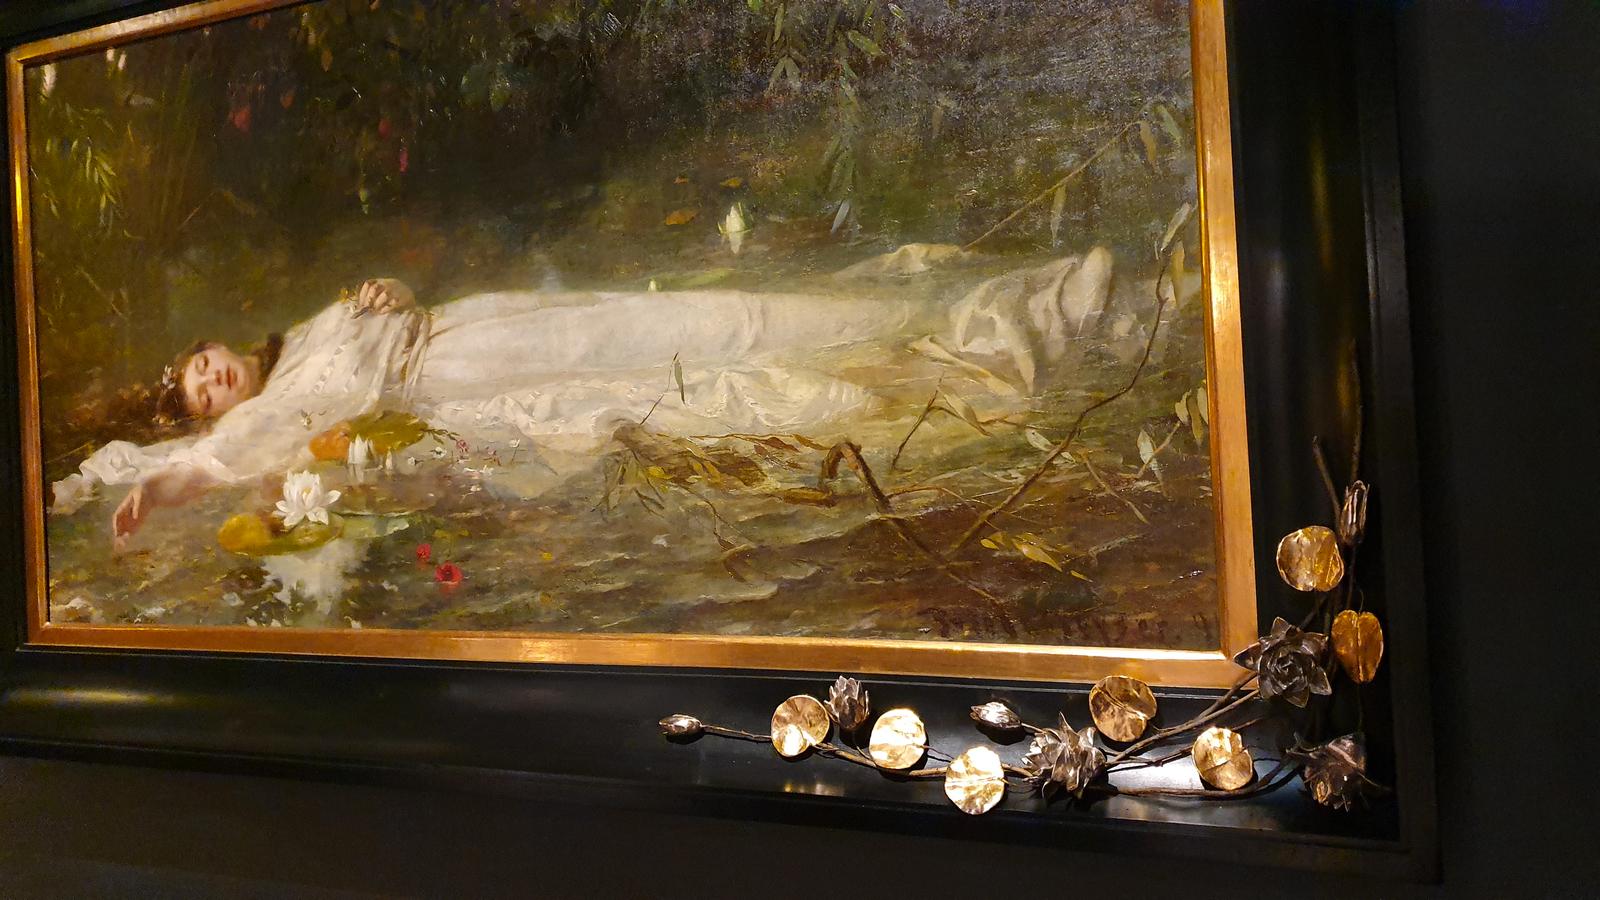 Symbolismus, Hamlet, Shakespeare-Gemälde